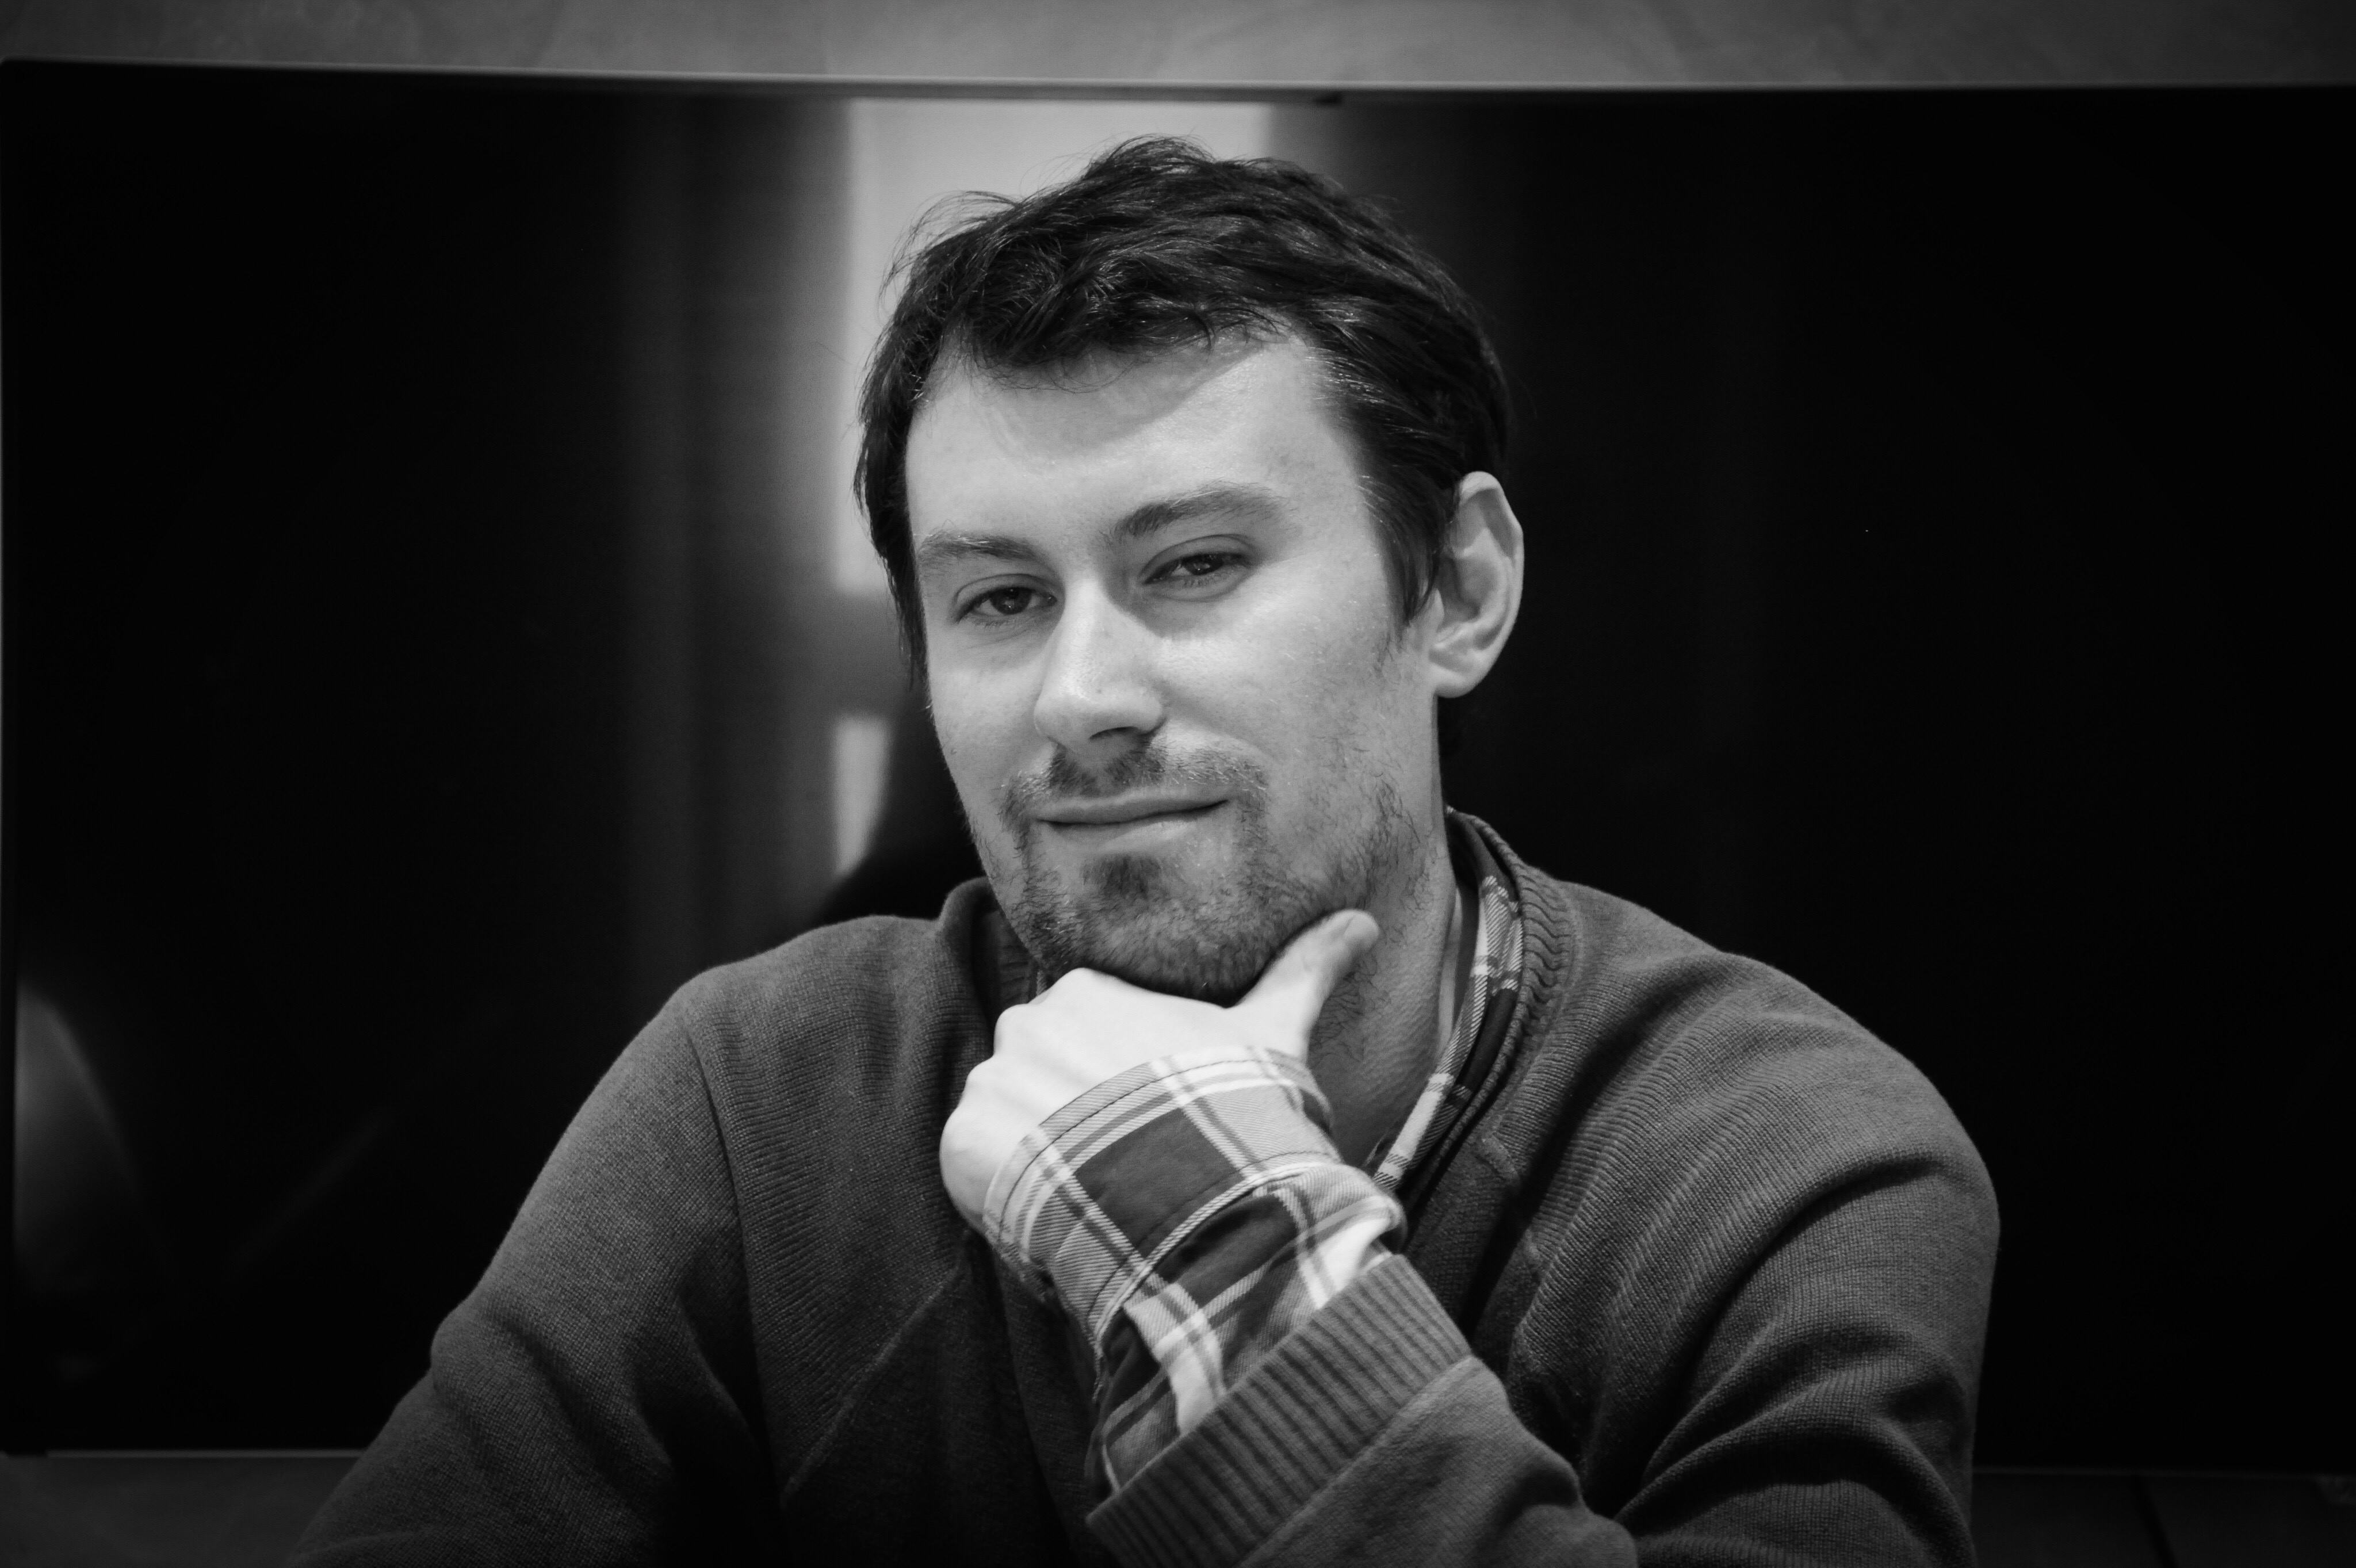 Eric Heinz